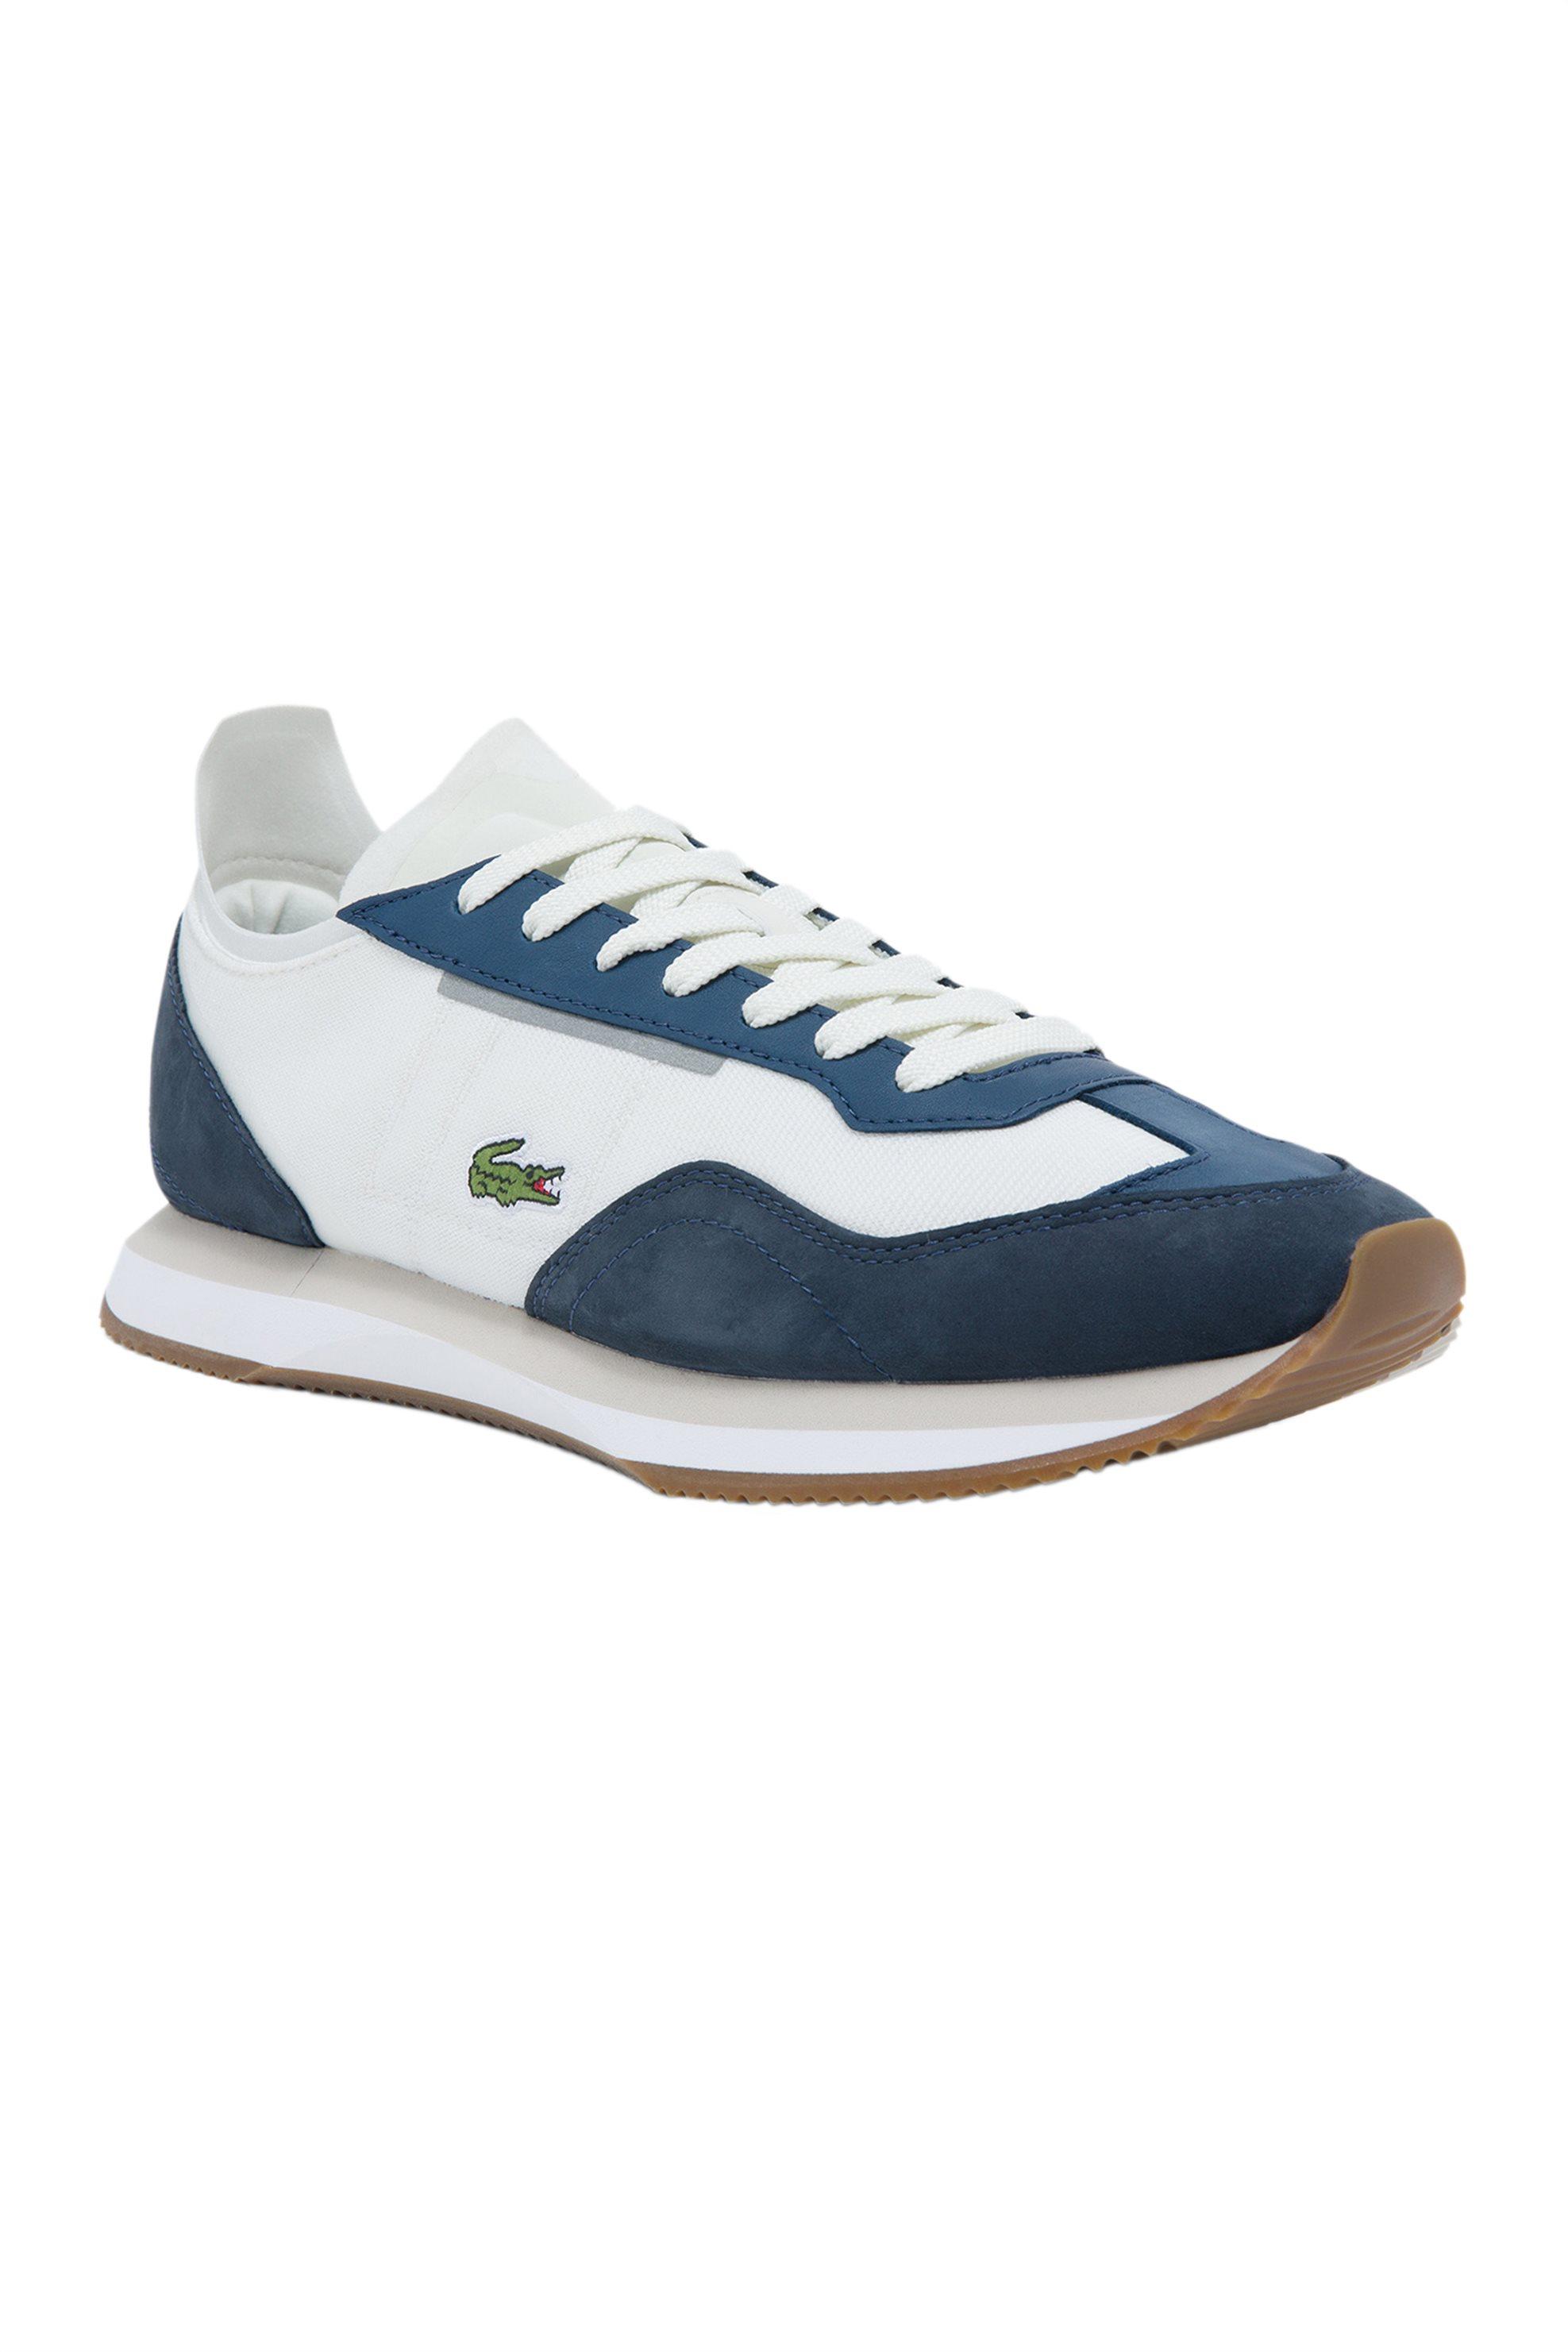 "Lacoste ανδρικά sneakers ""Match Break"" – 41SMA0103WN1 – Λευκό"